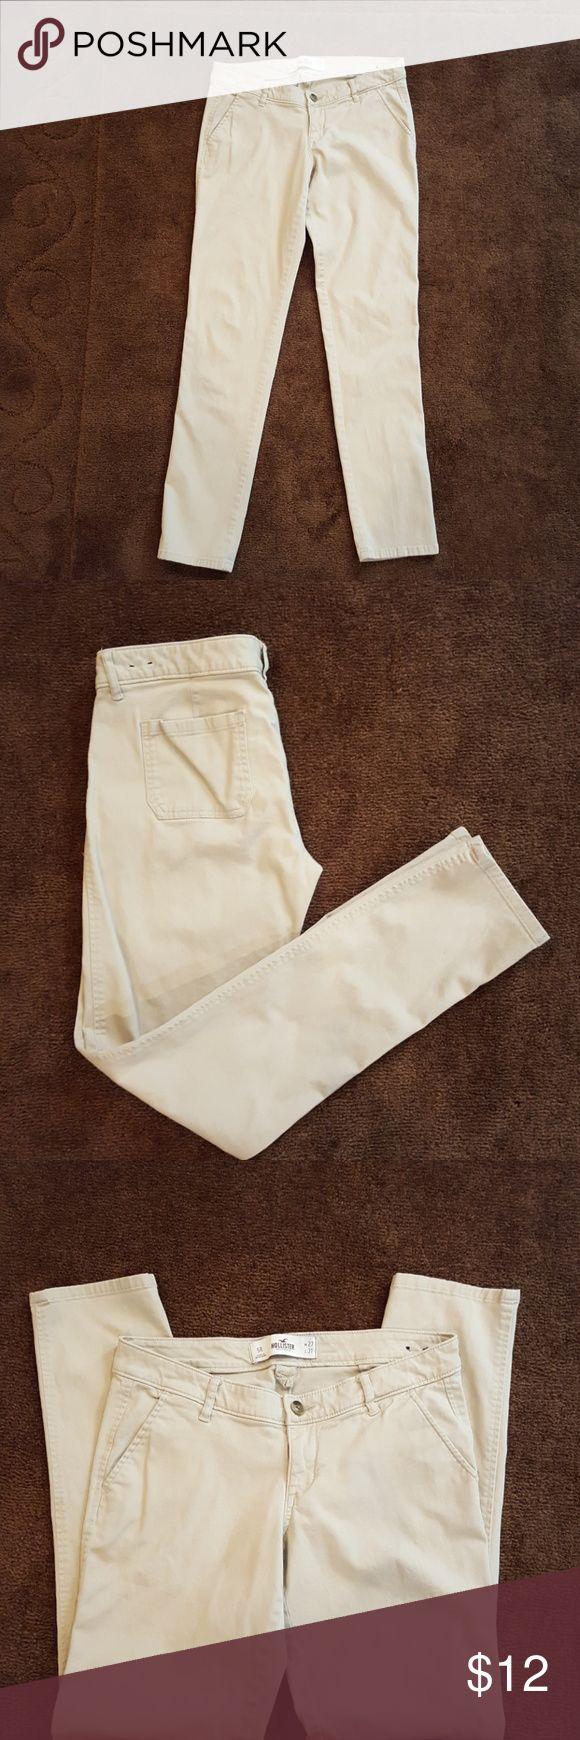 Hollister khakis Hollister khakis, size 5. 98%cotton 2% elastin Hollister Pants Trousers